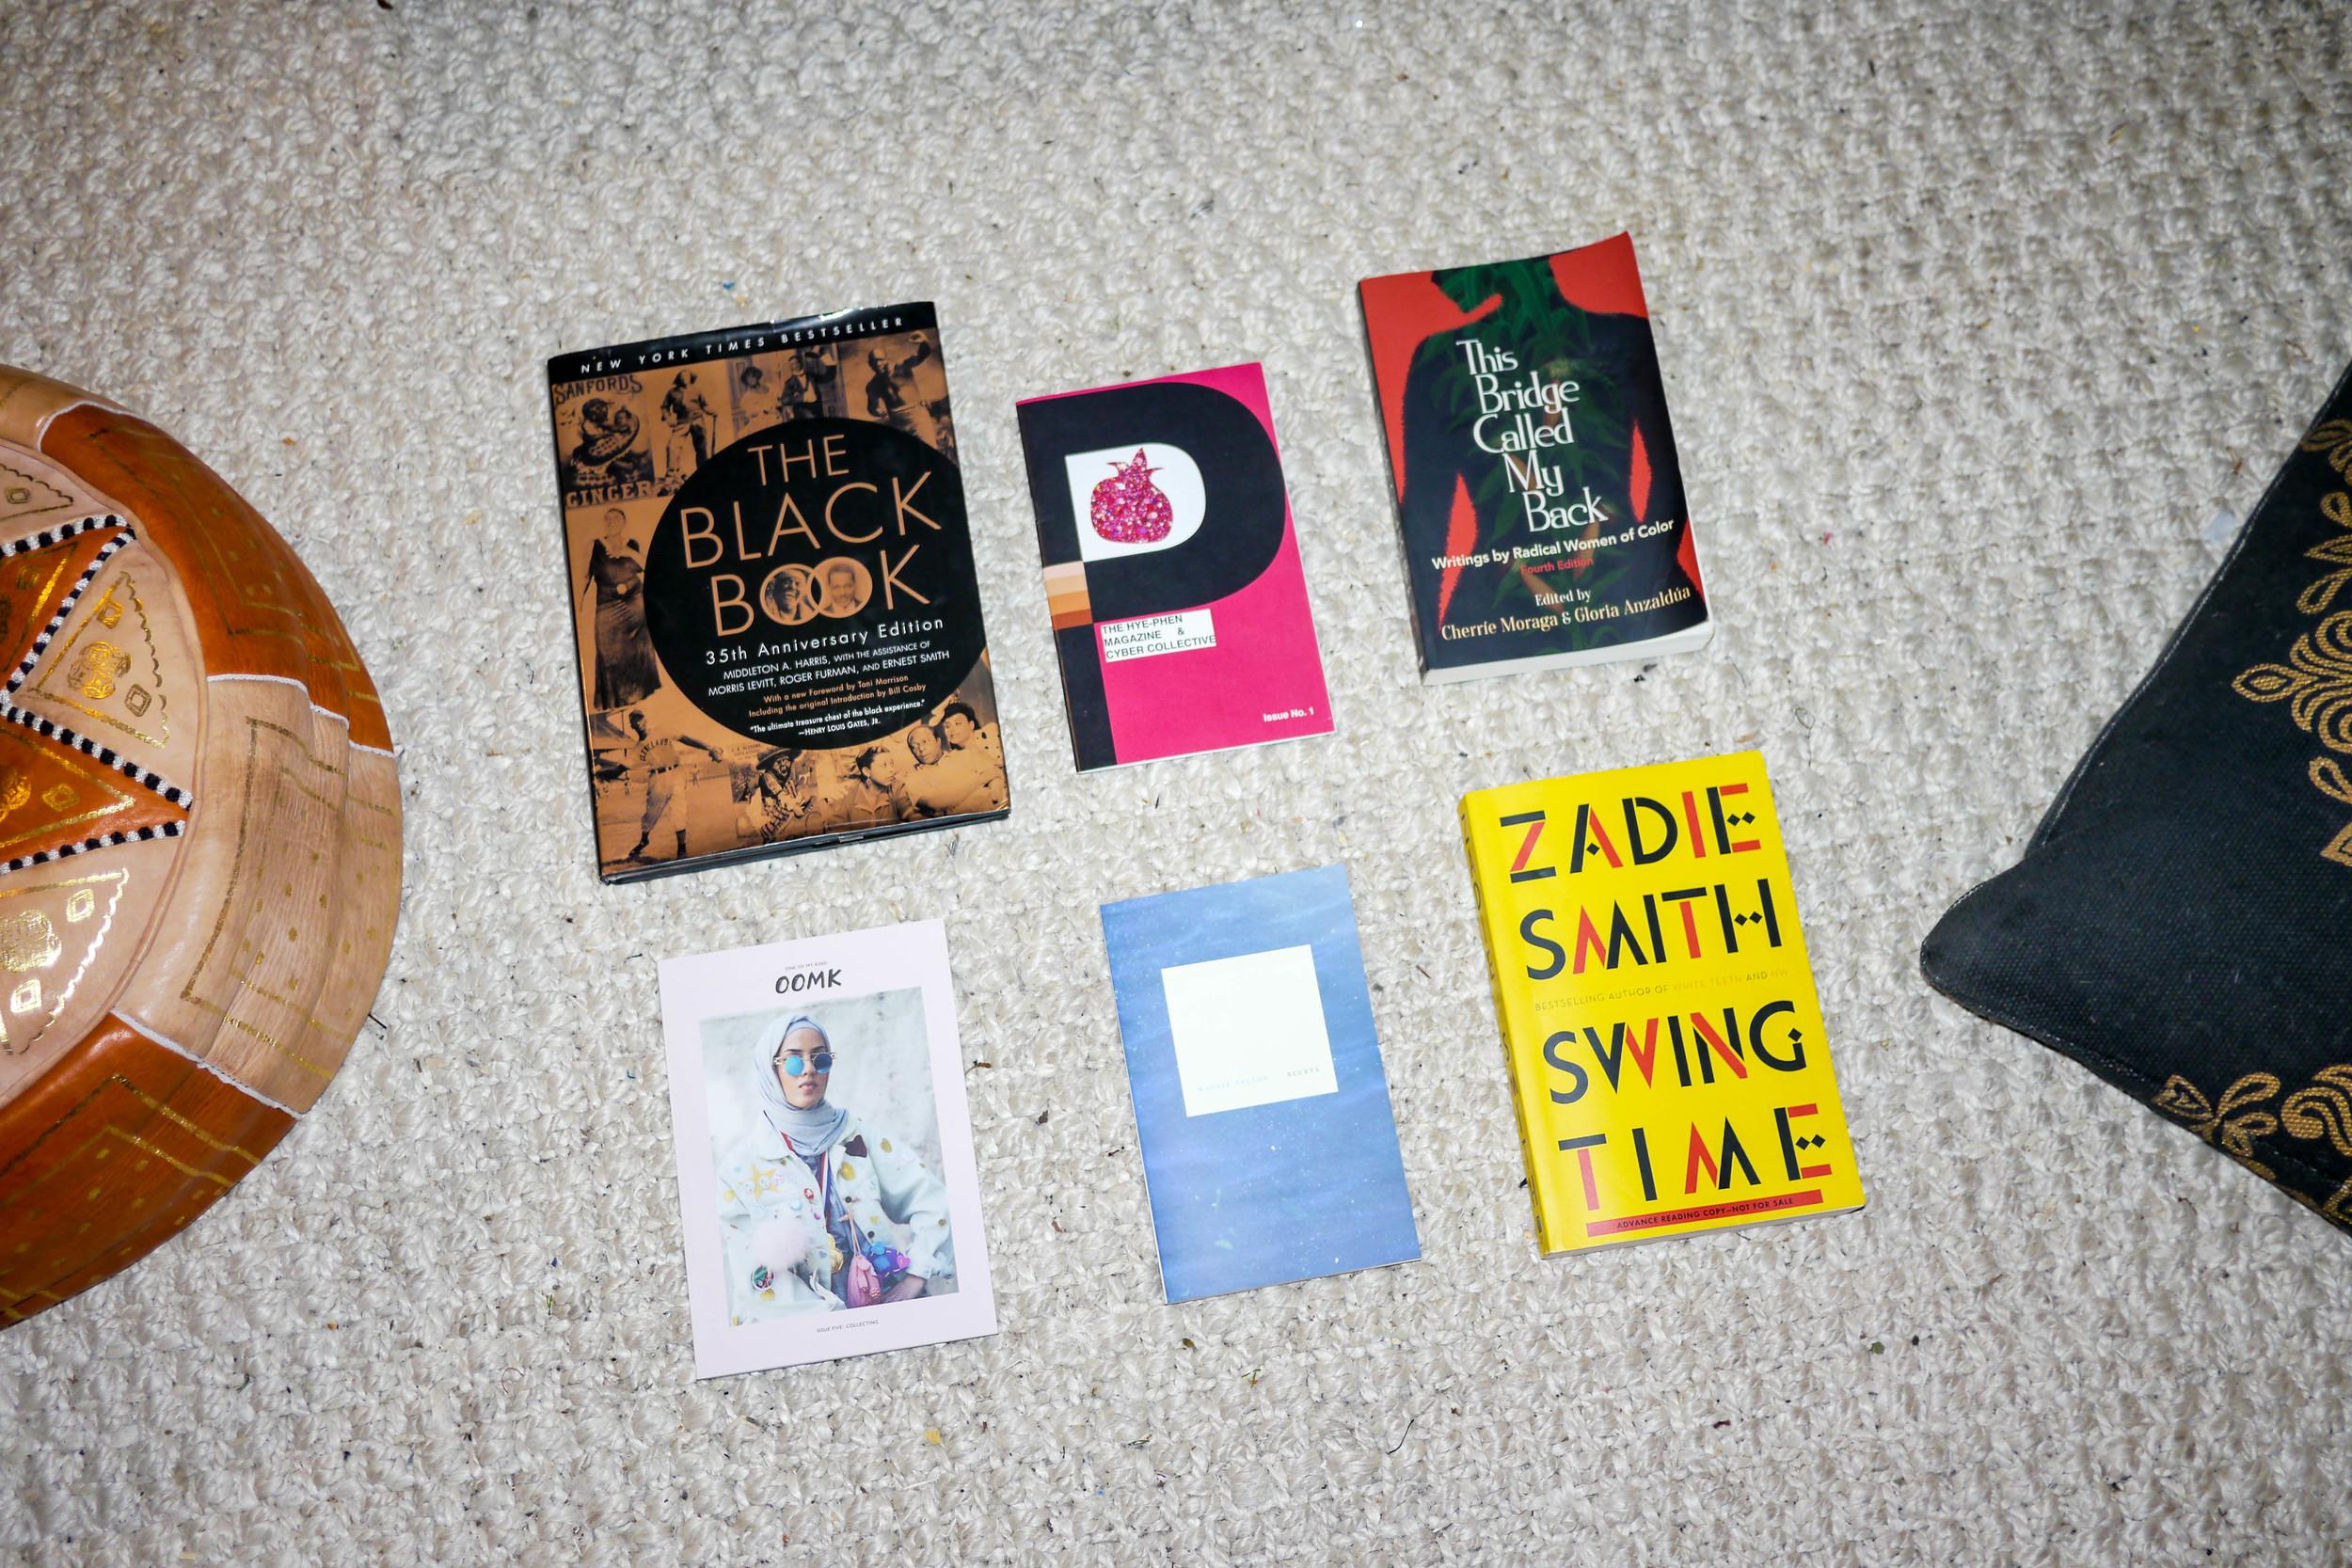 Jenna's favorite books